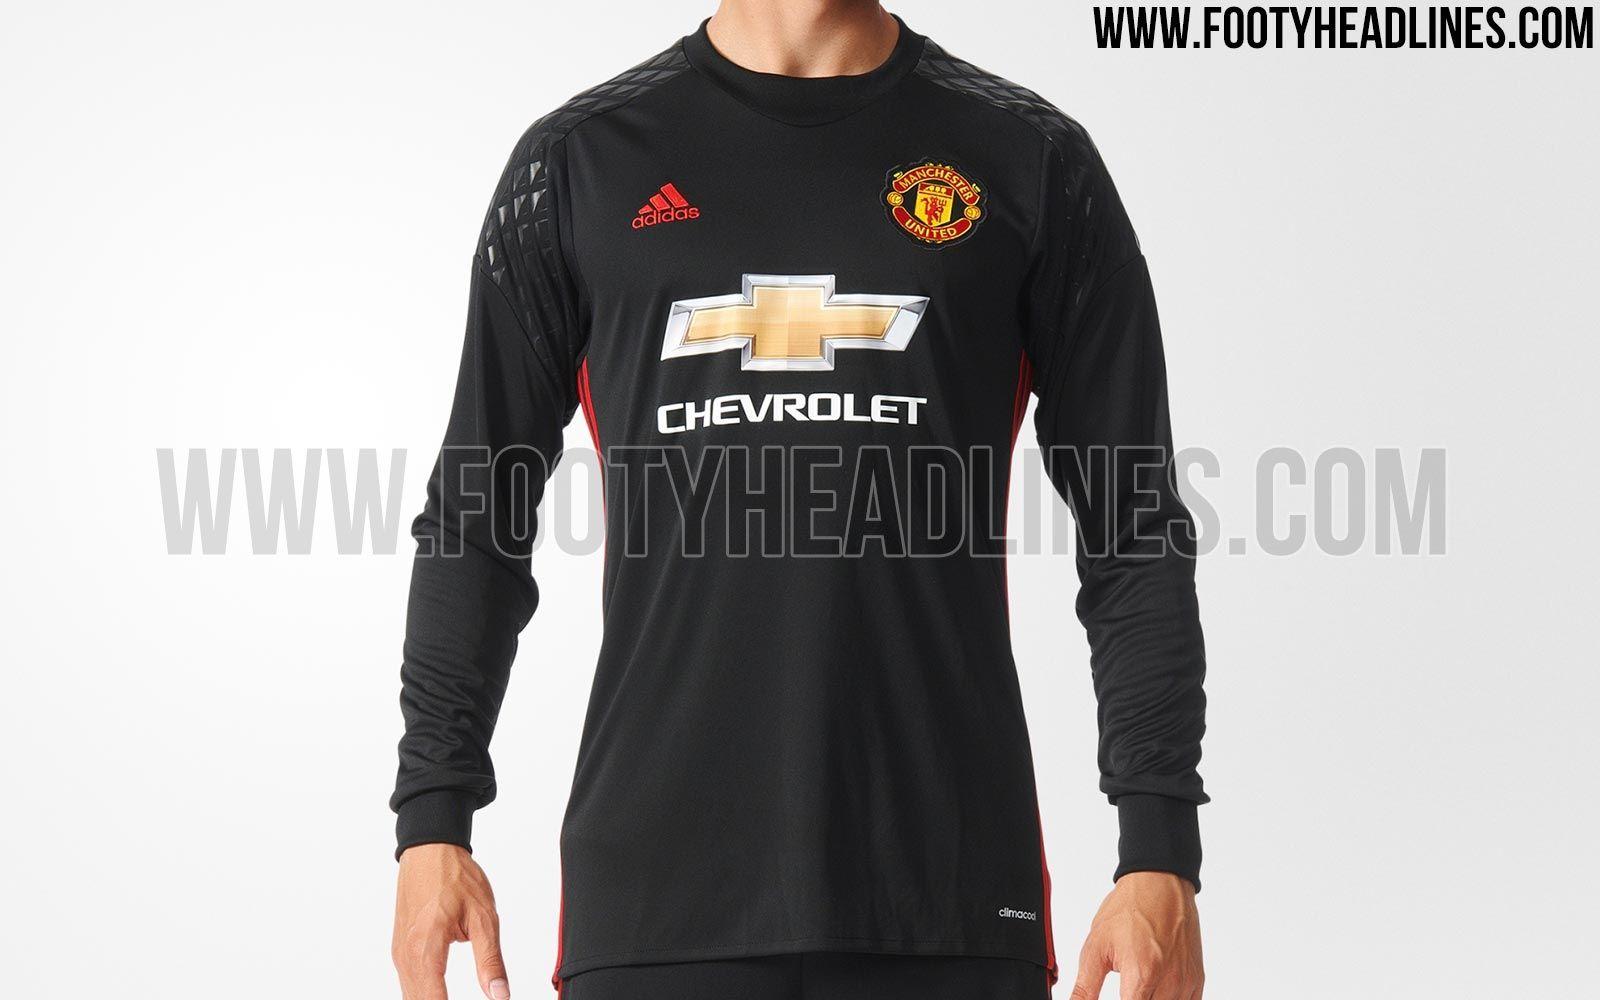 76f4c20dd09 Manchester United 16-17 Goalkeeper Kit Leaked - Footy Headlines ...